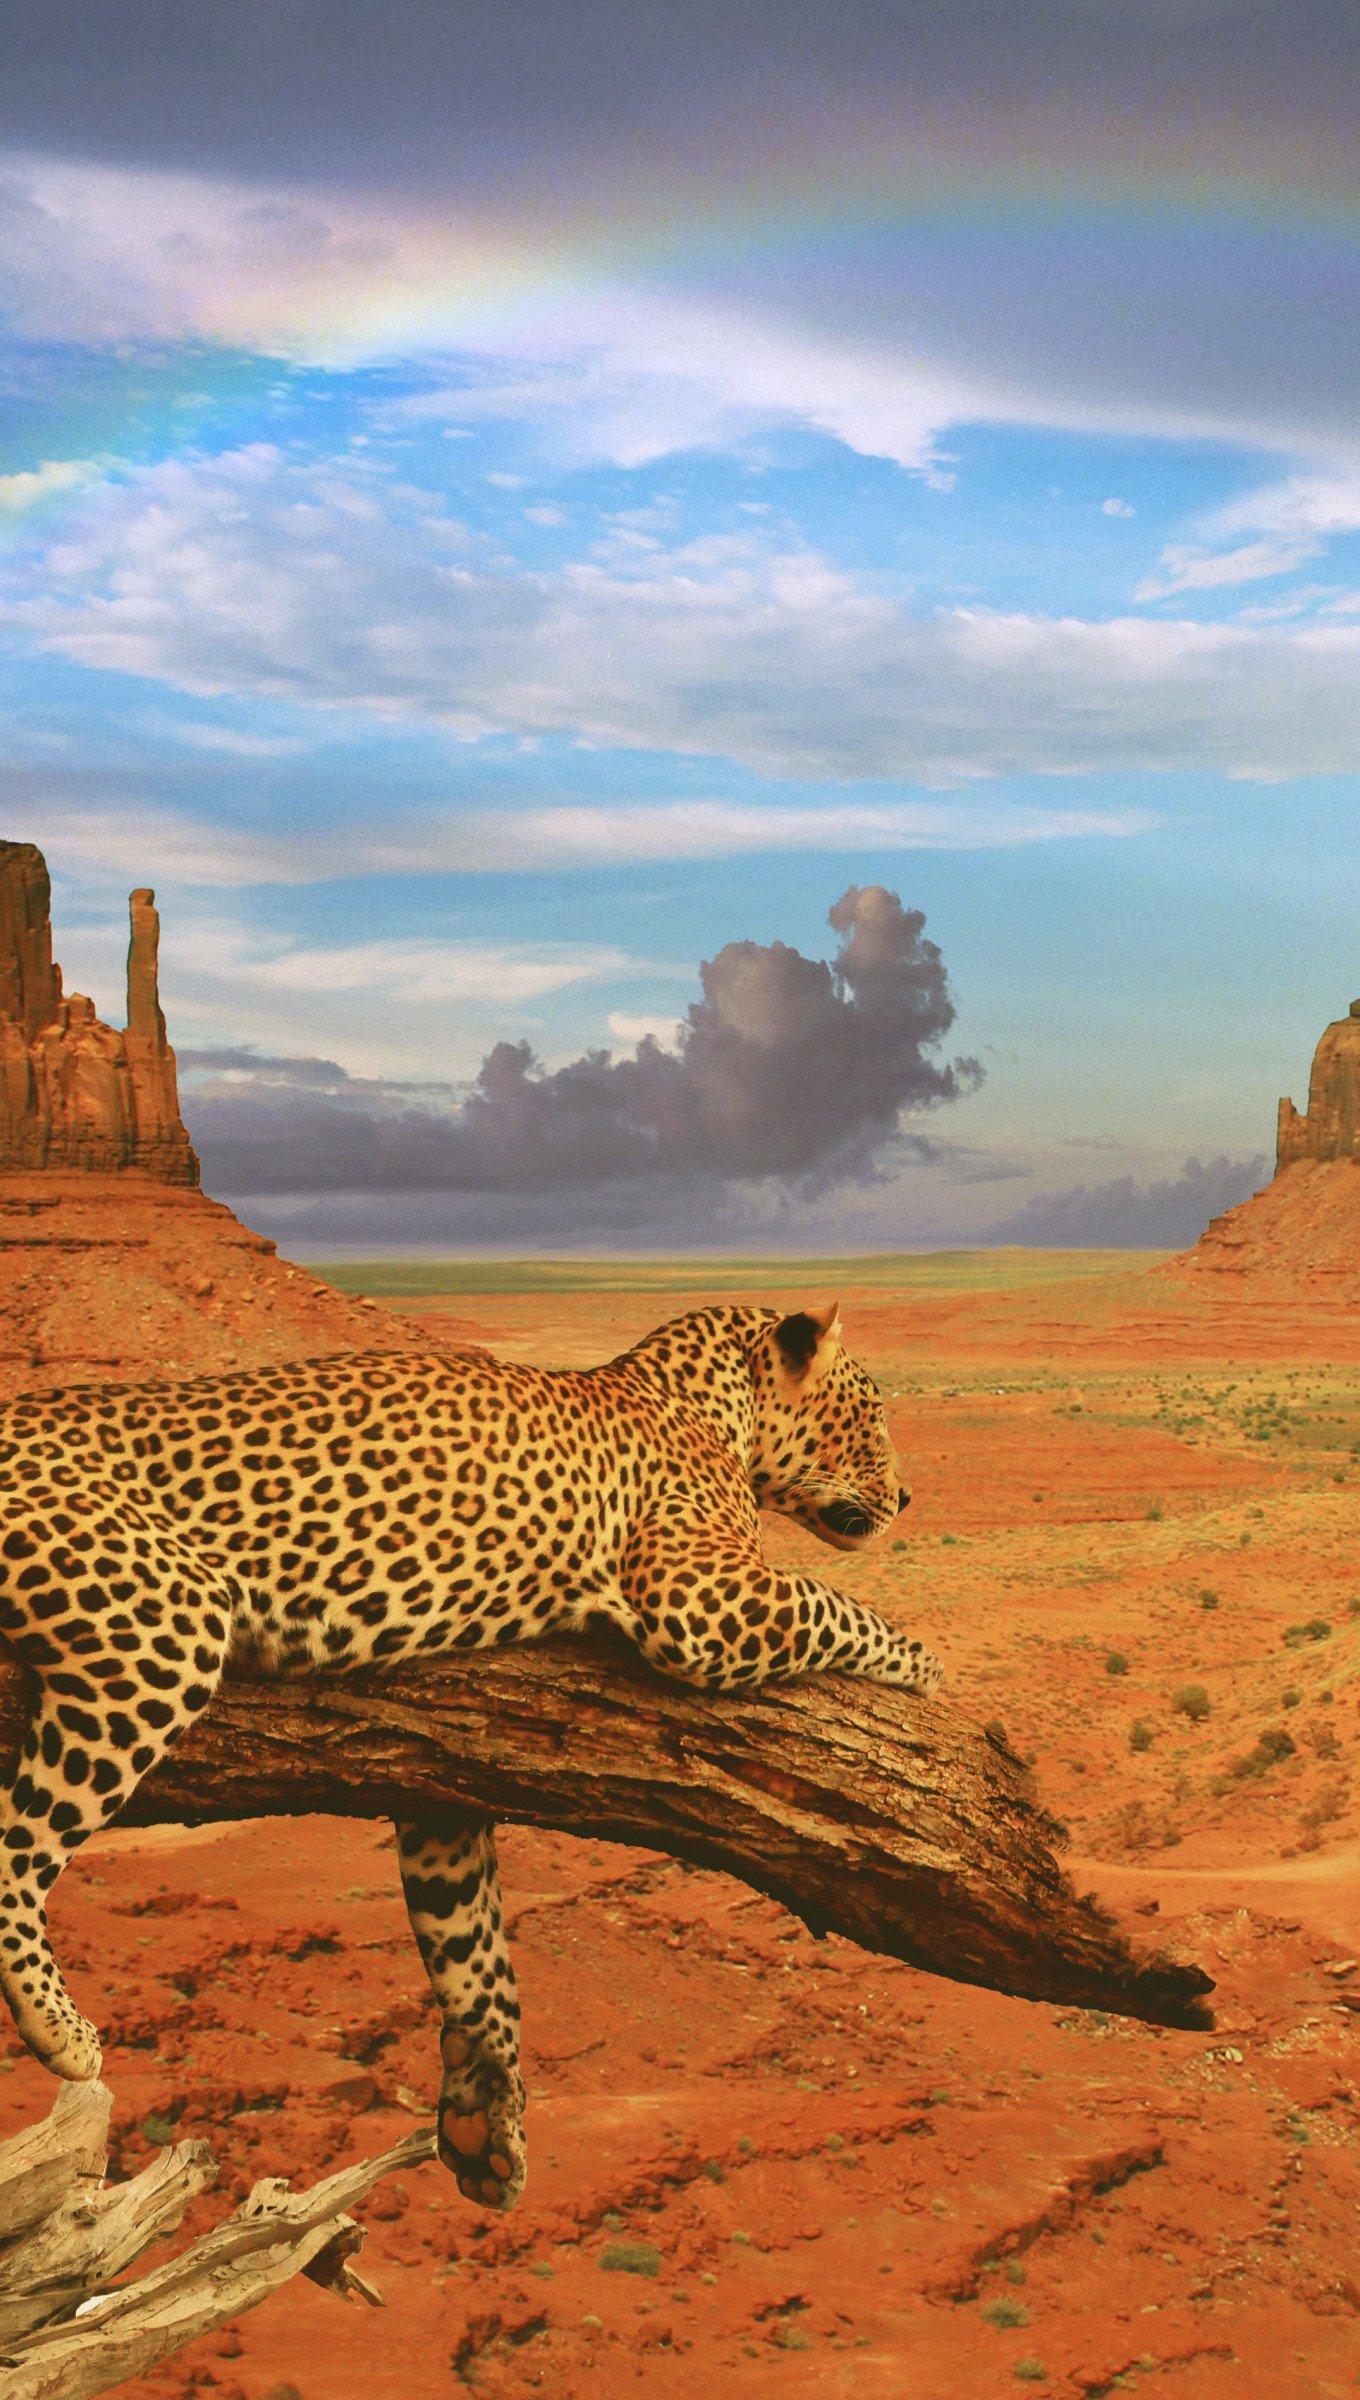 Wallpaper Leopard in desert landscape with rainbow Vertical